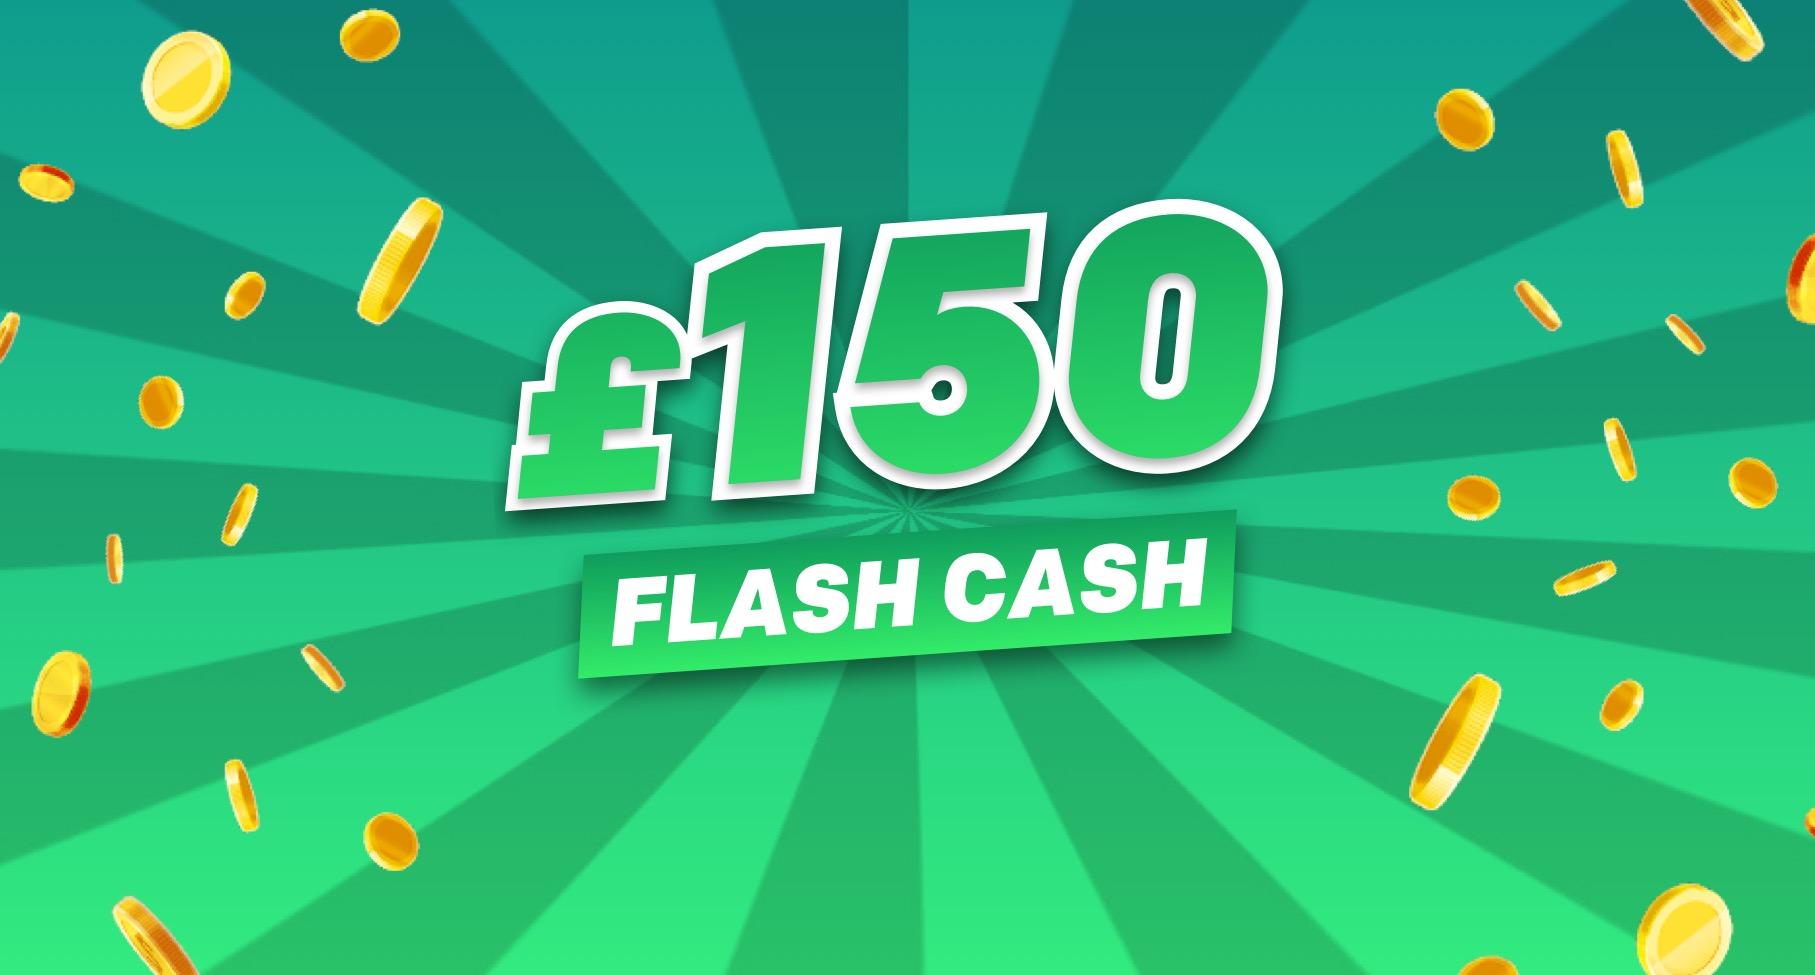 Flash 150